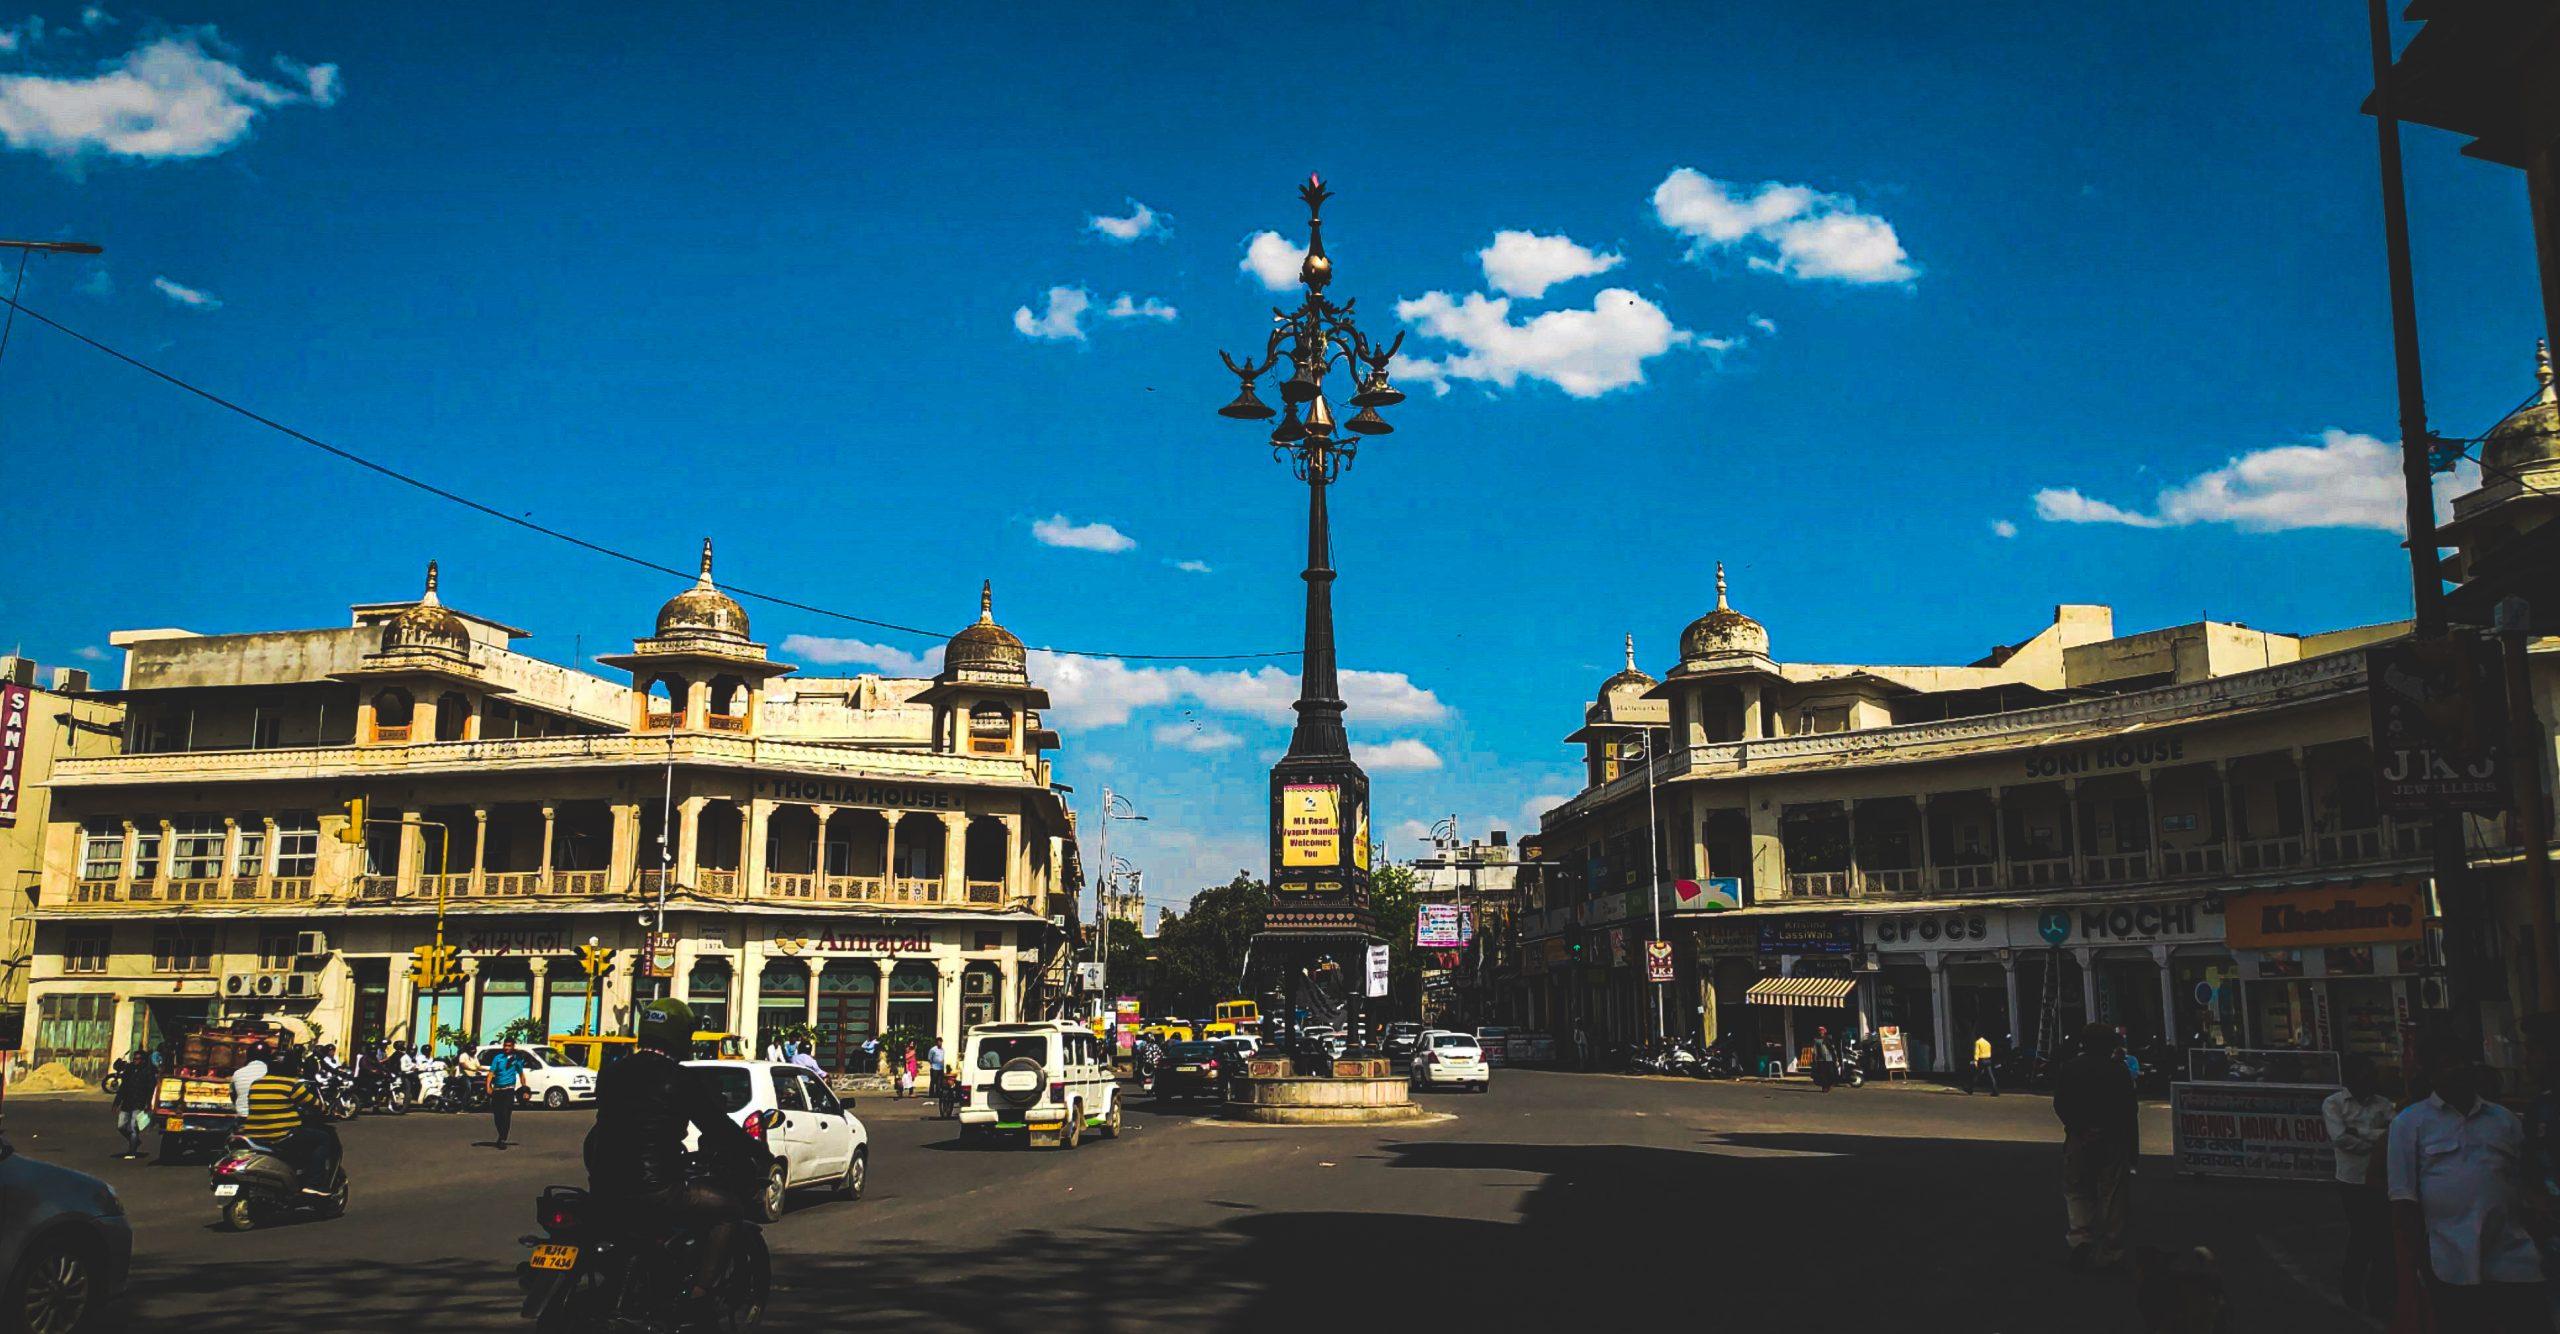 Panch Batti locality in Jaipur